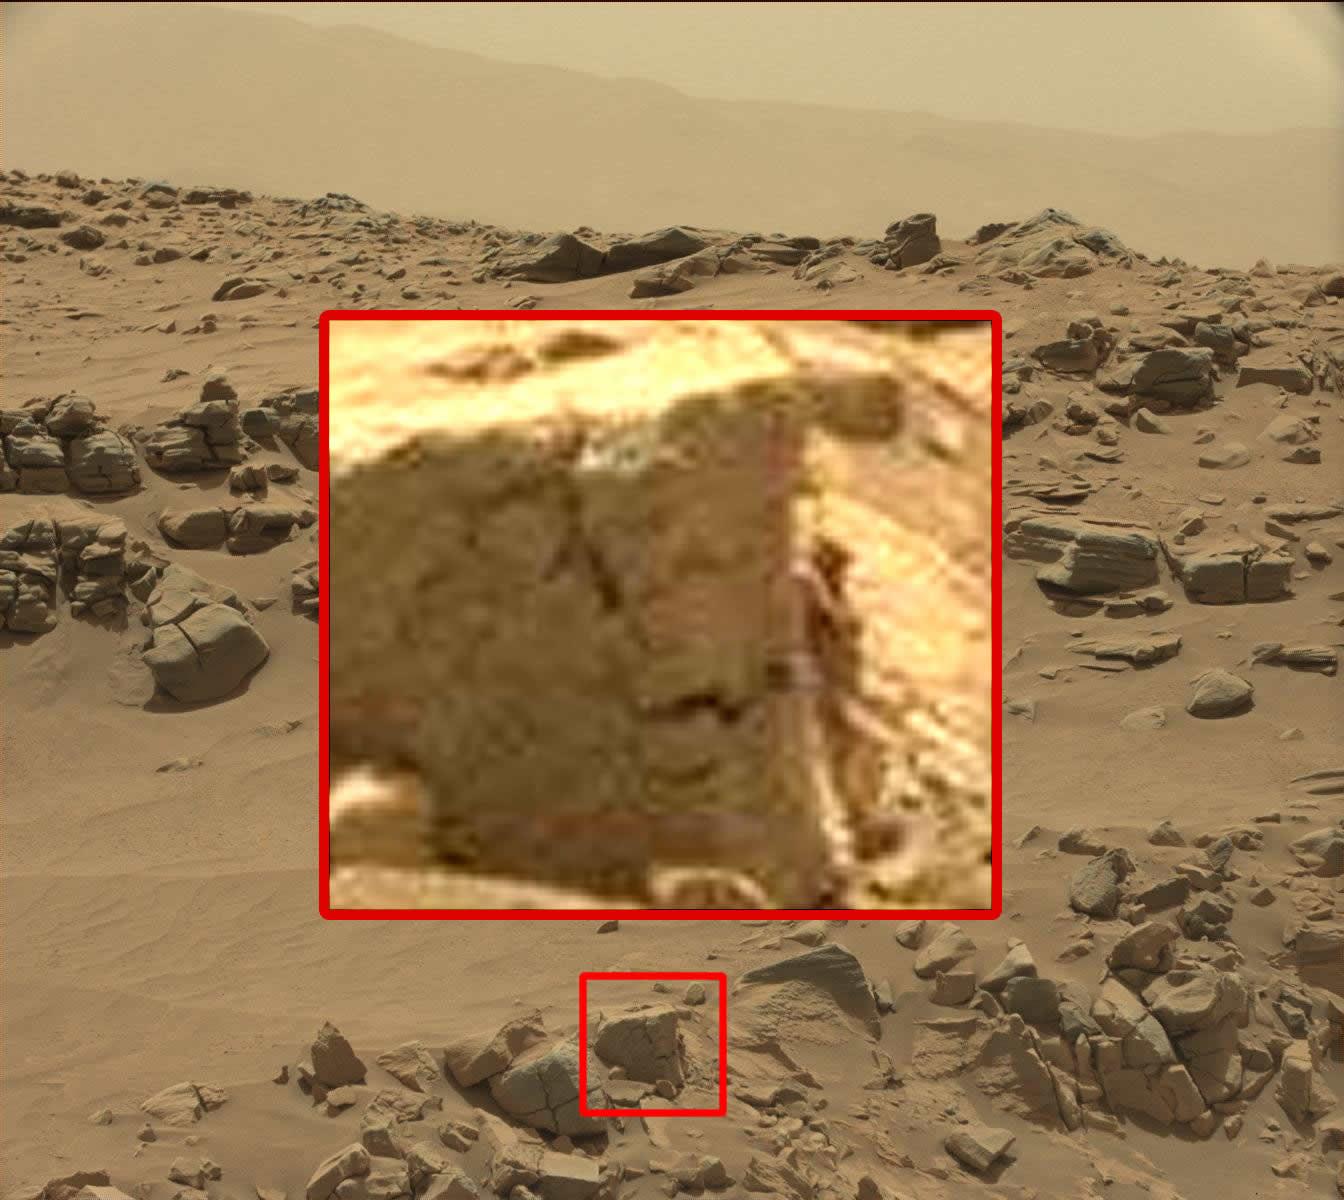 ¿Humanoide en imagen captada por Curiosity en Marte?